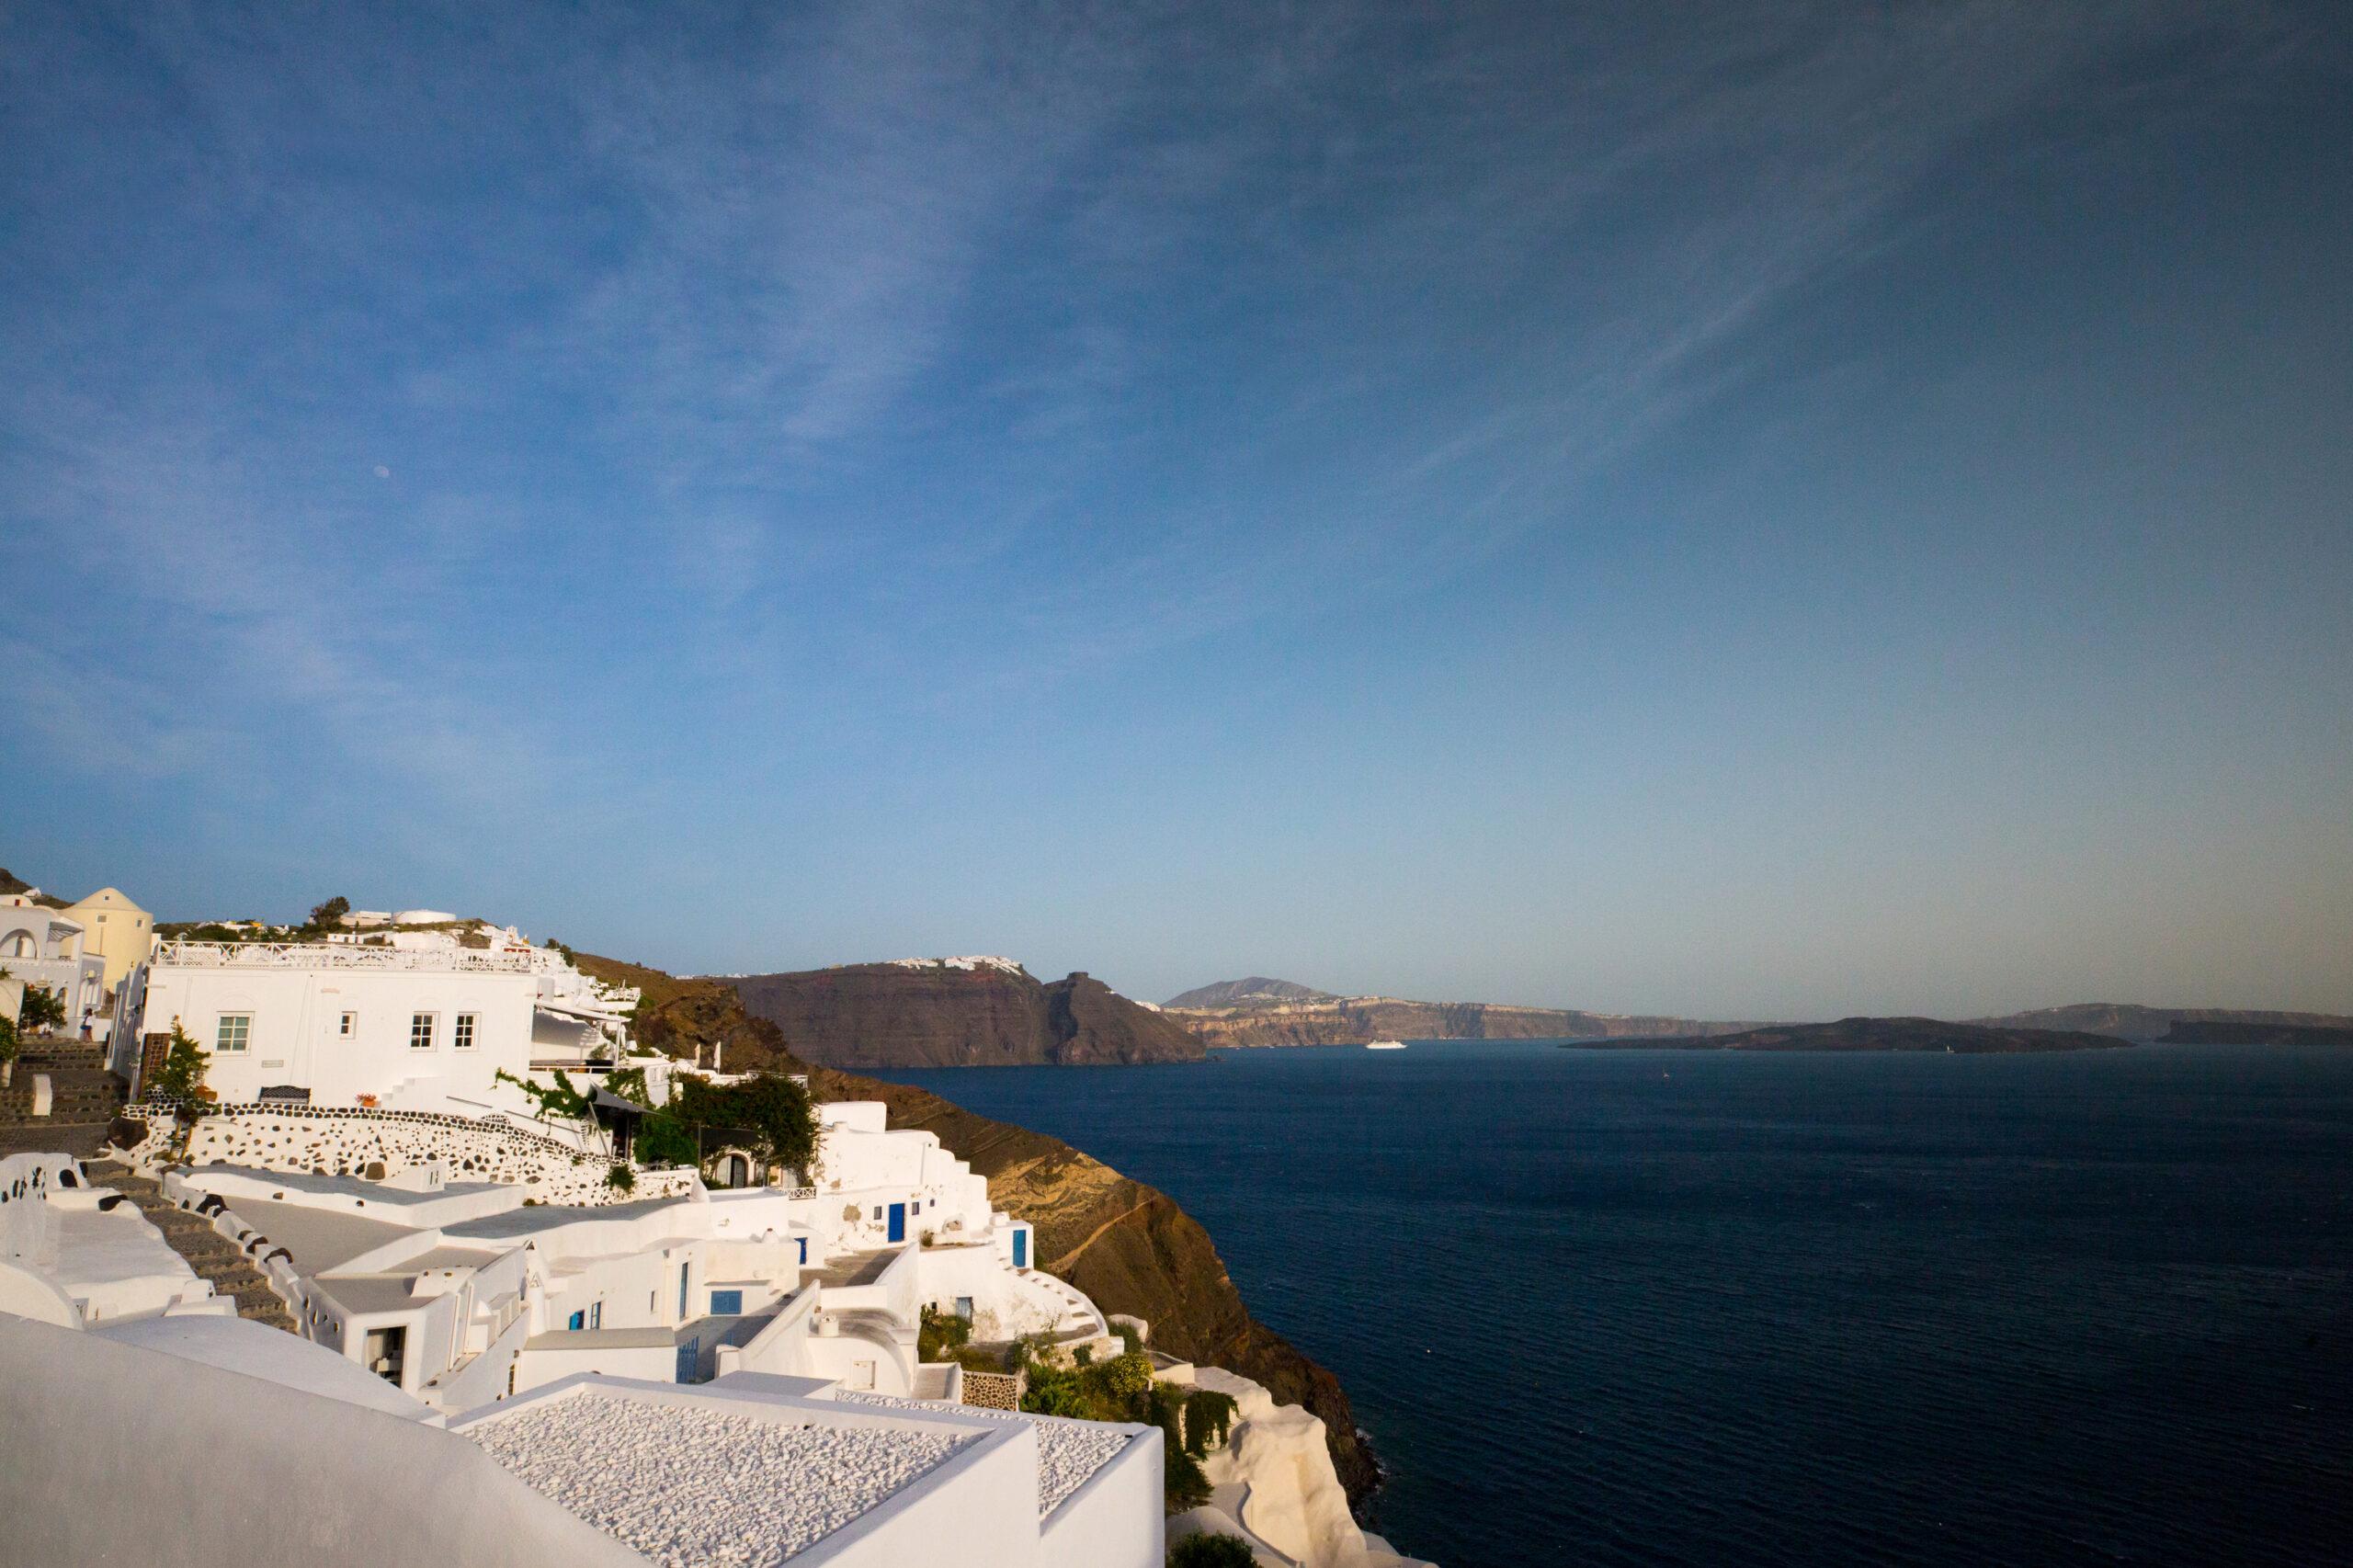 Круиз по островам Греции